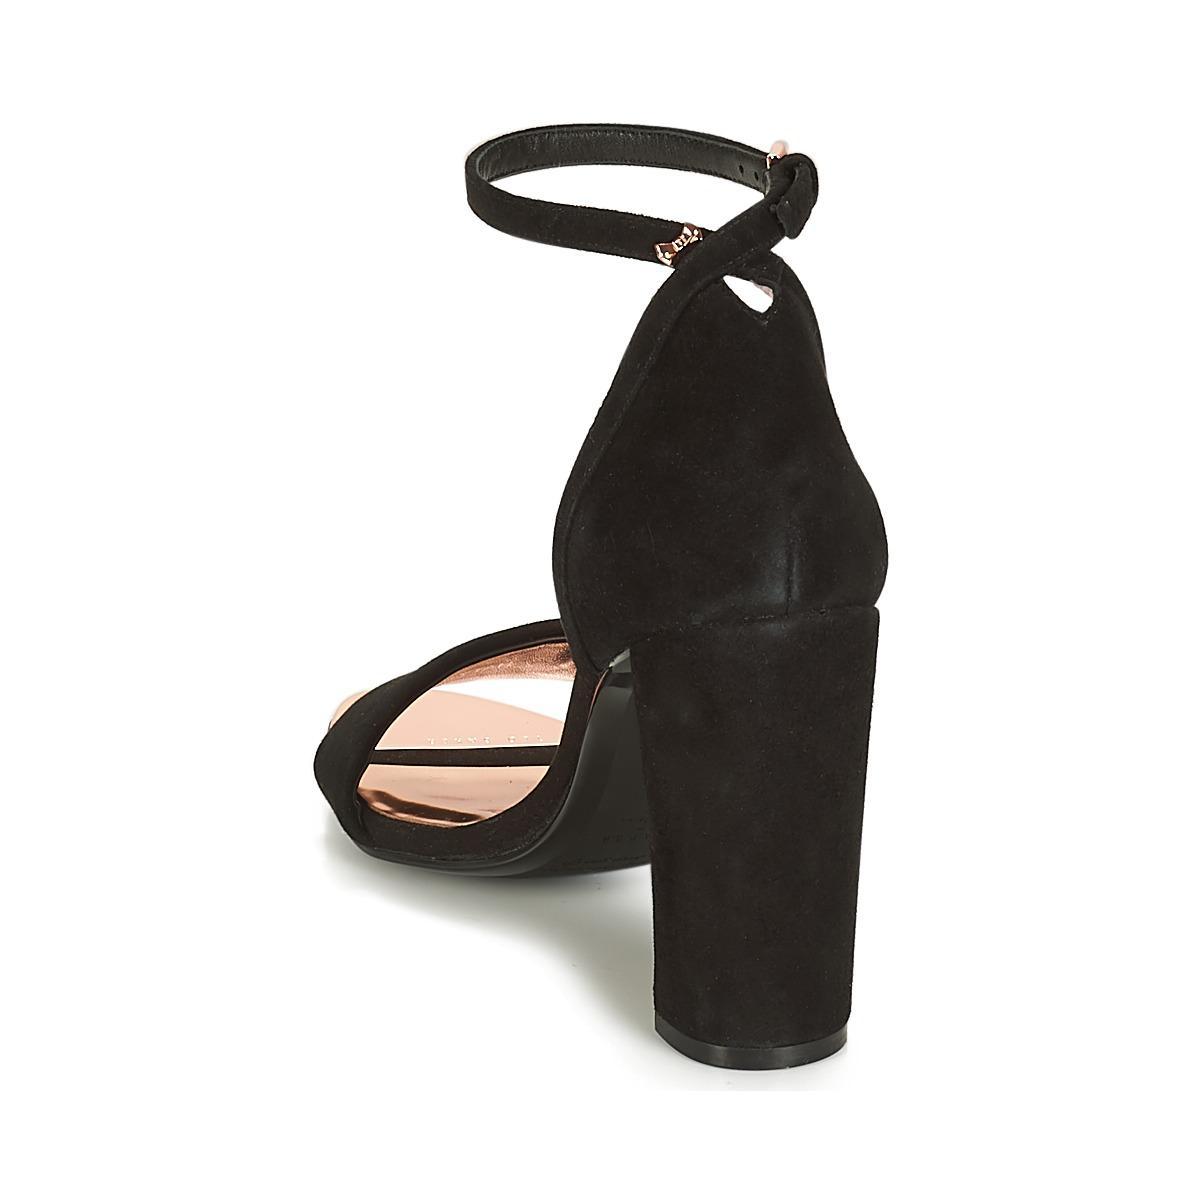 43879aeb3 Ted Baker Phanda Women s Court Shoes In Black in Black - Lyst